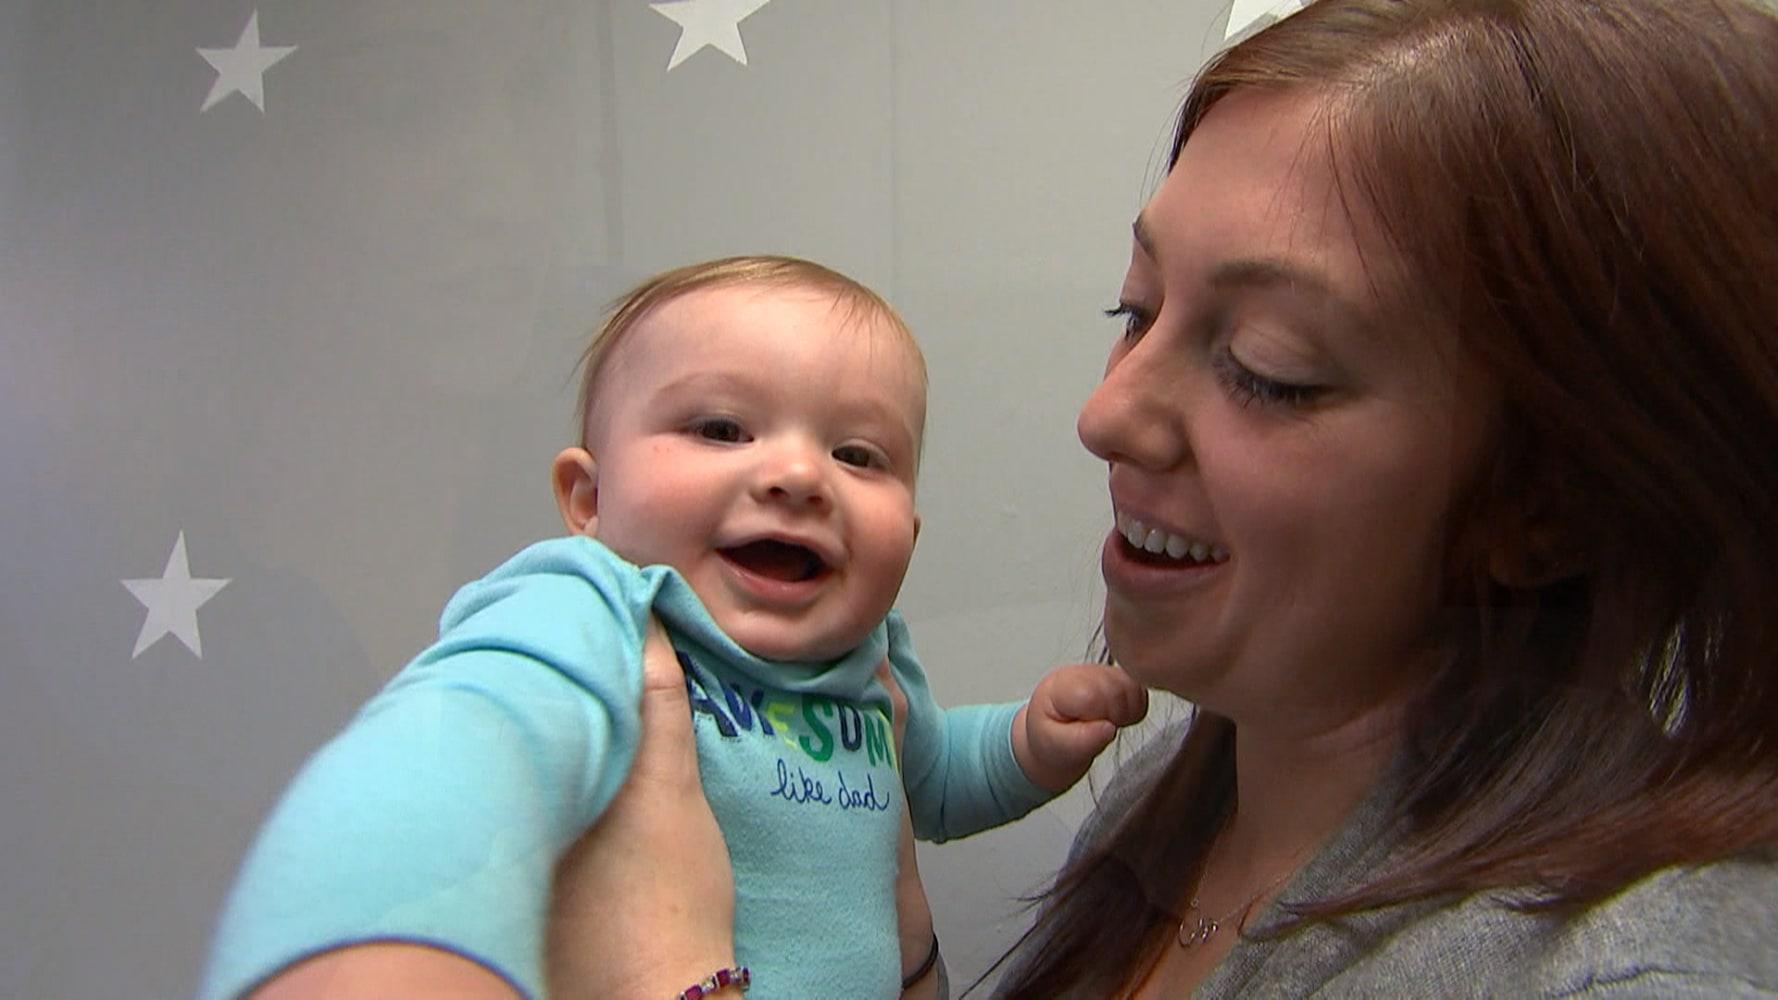 Jocelyn Maynes and her son Bronson NBC News